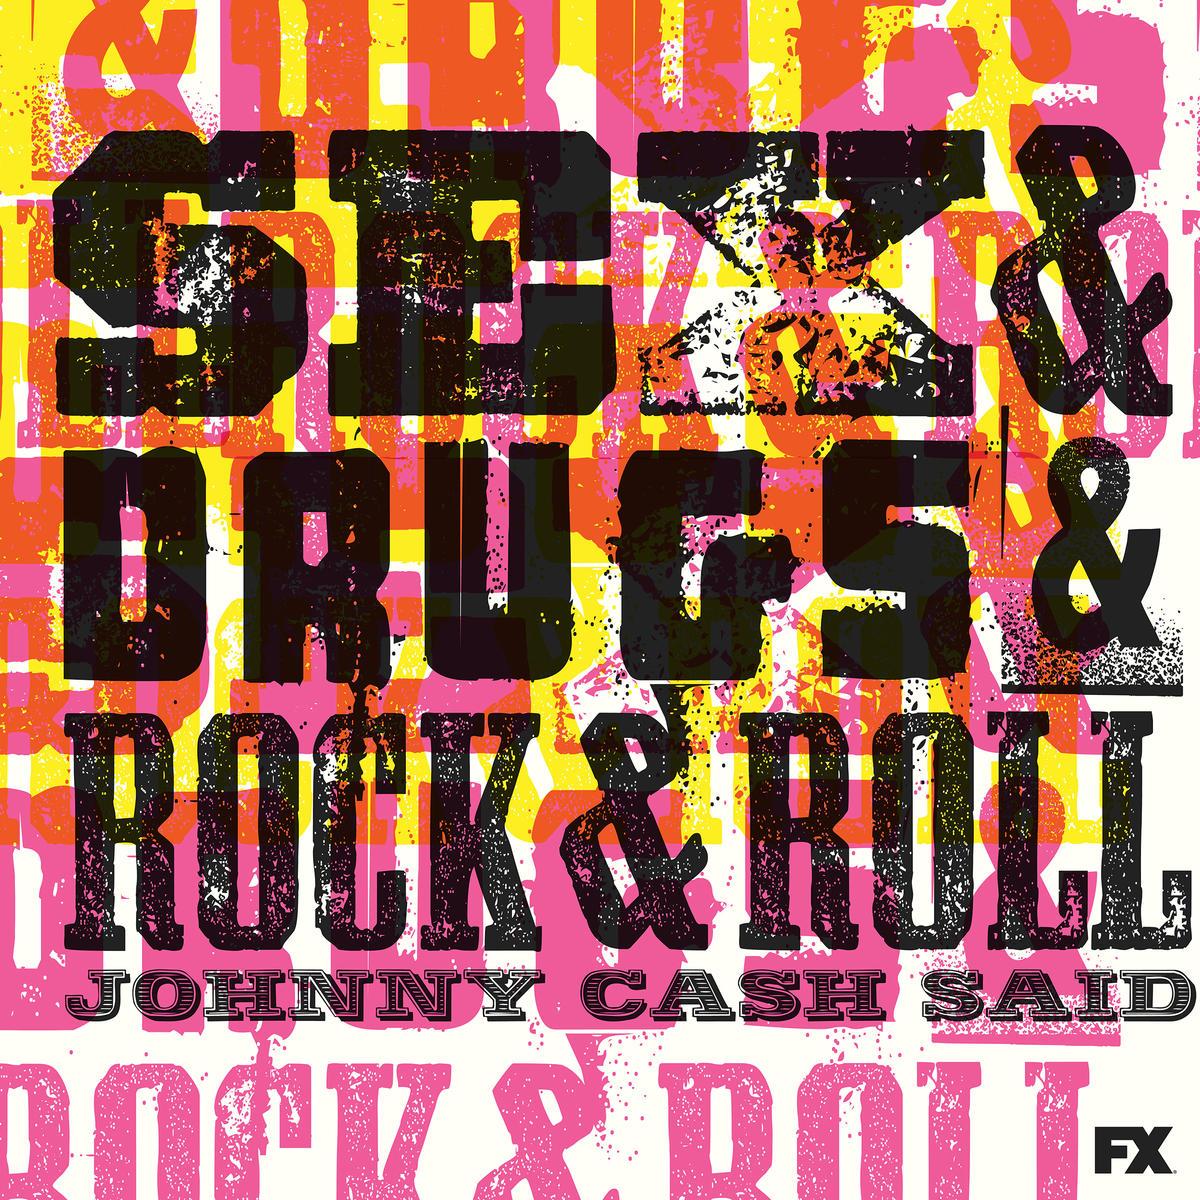 Секс нарктики и рок н ролл